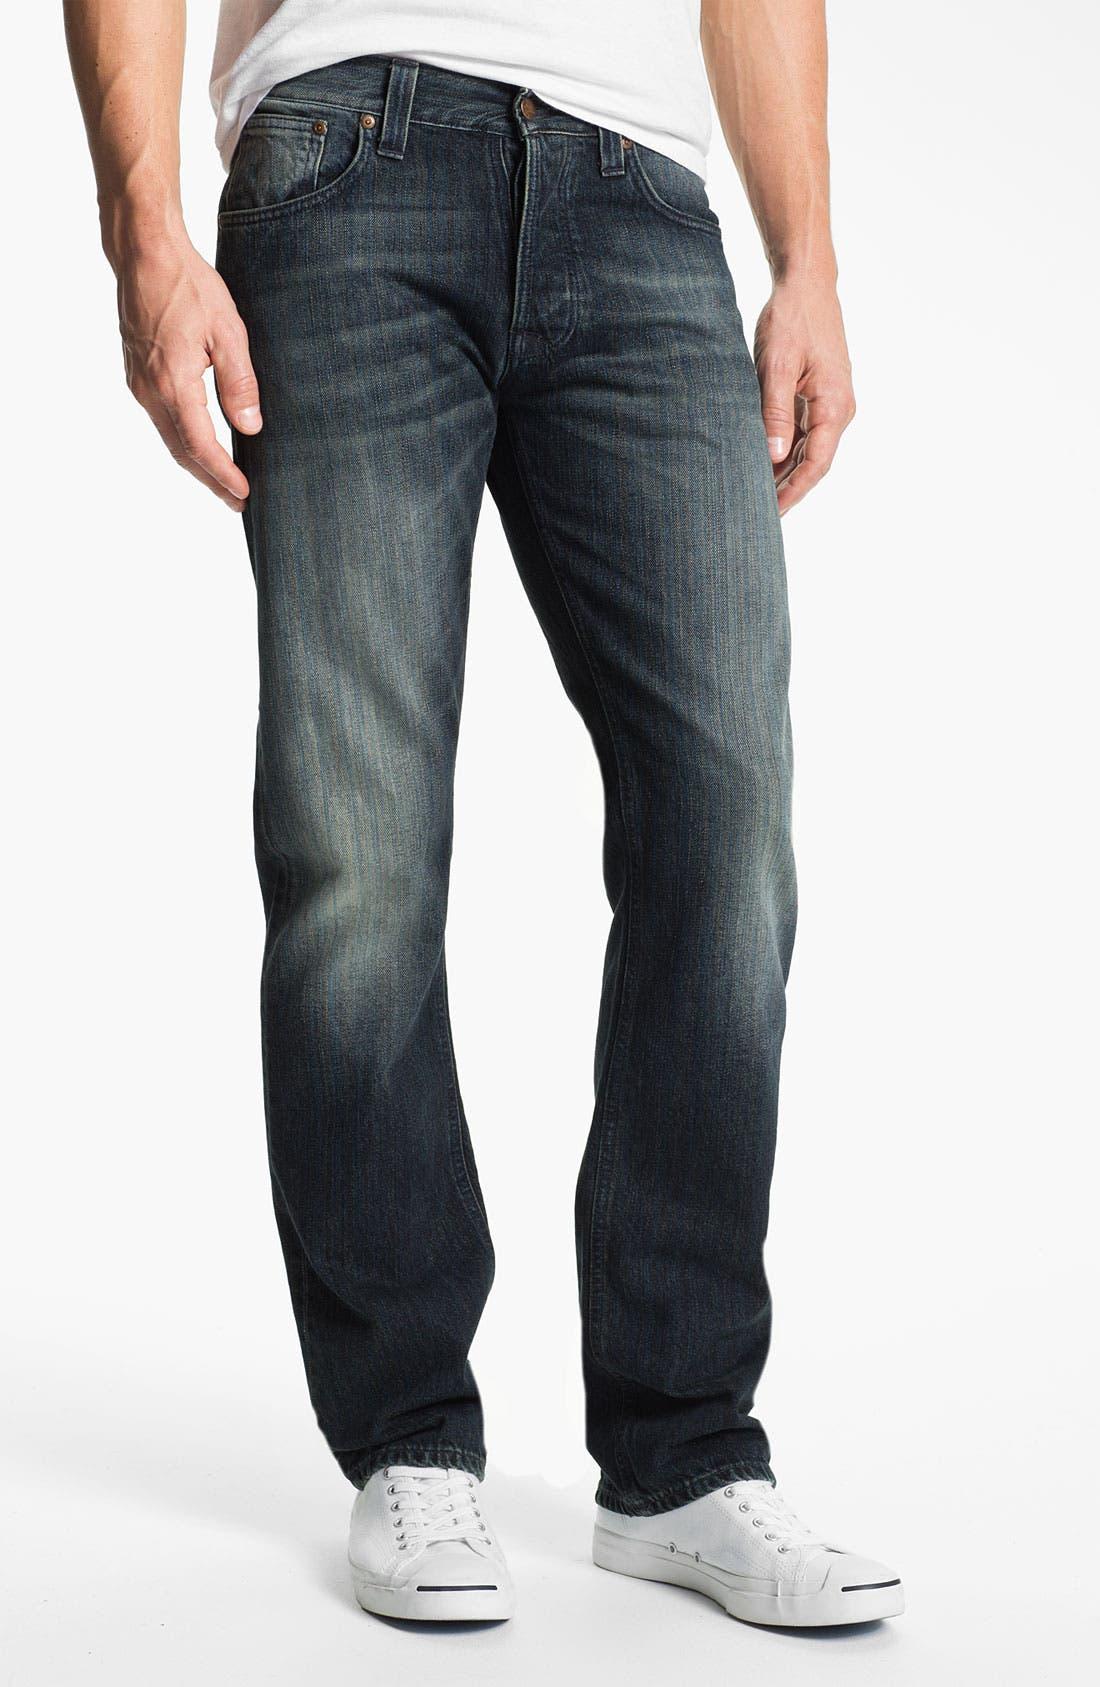 Alternate Image 2  - Nudie 'Average Joe' Straight Leg Jeans (Organic Black and Blue)